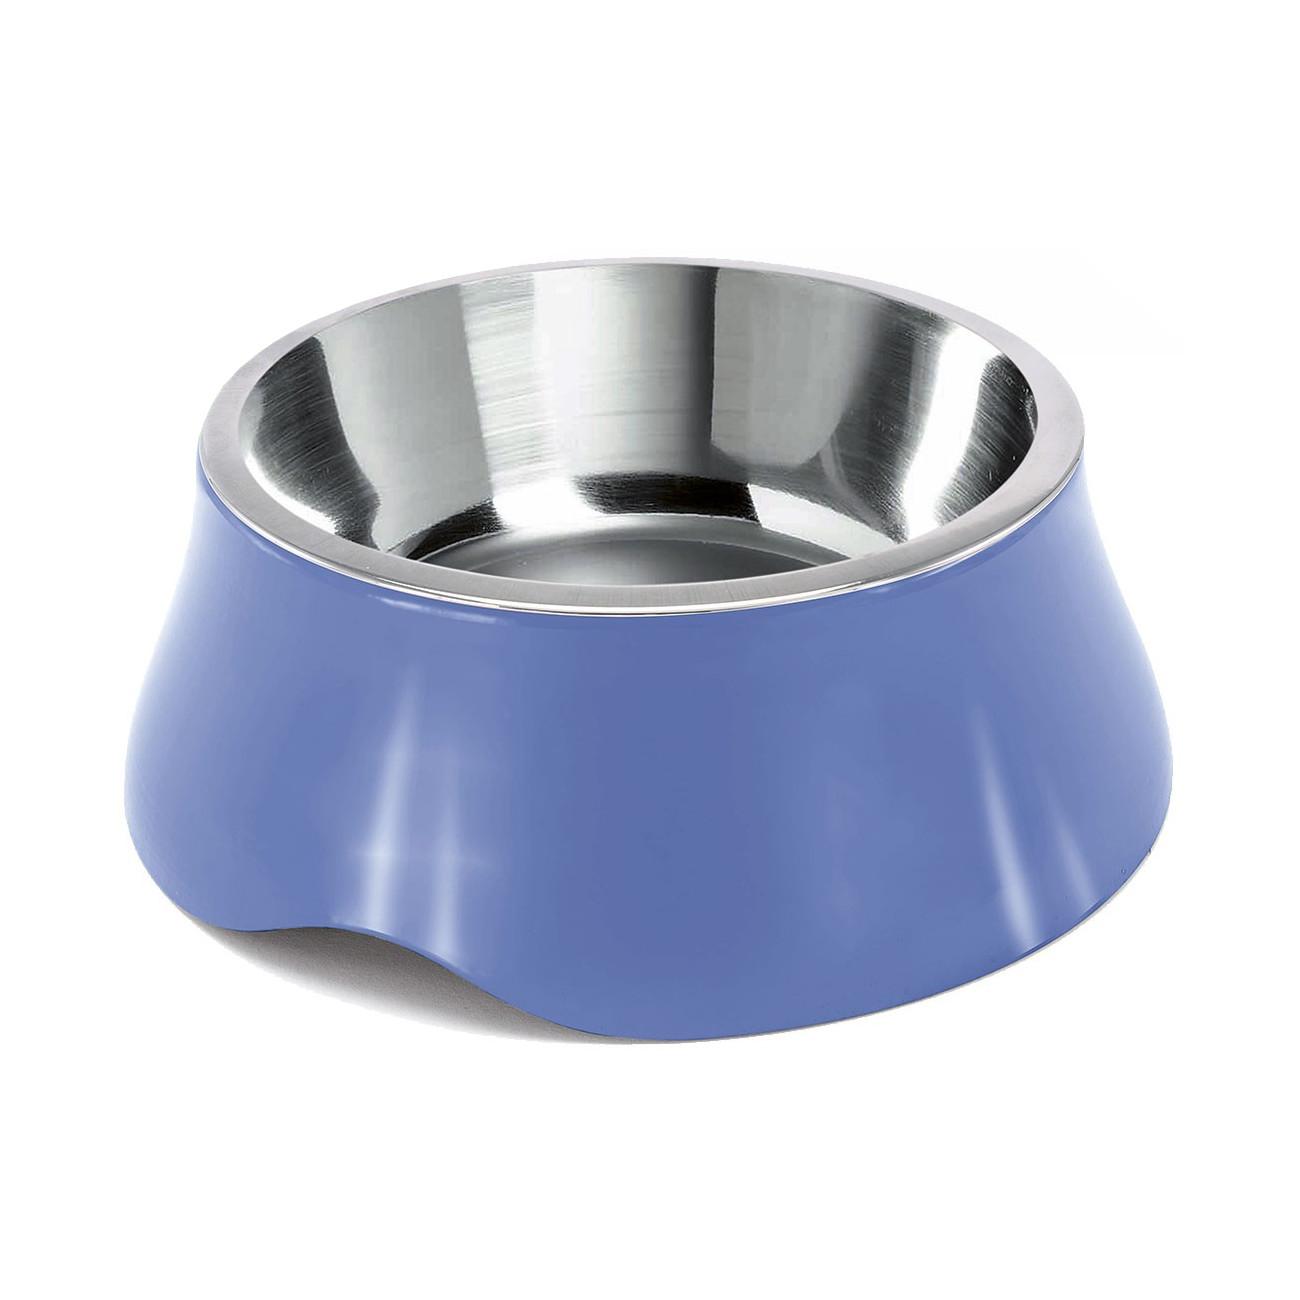 Miska pro psa Argi - nerez / plast - modrá - 1900 ml